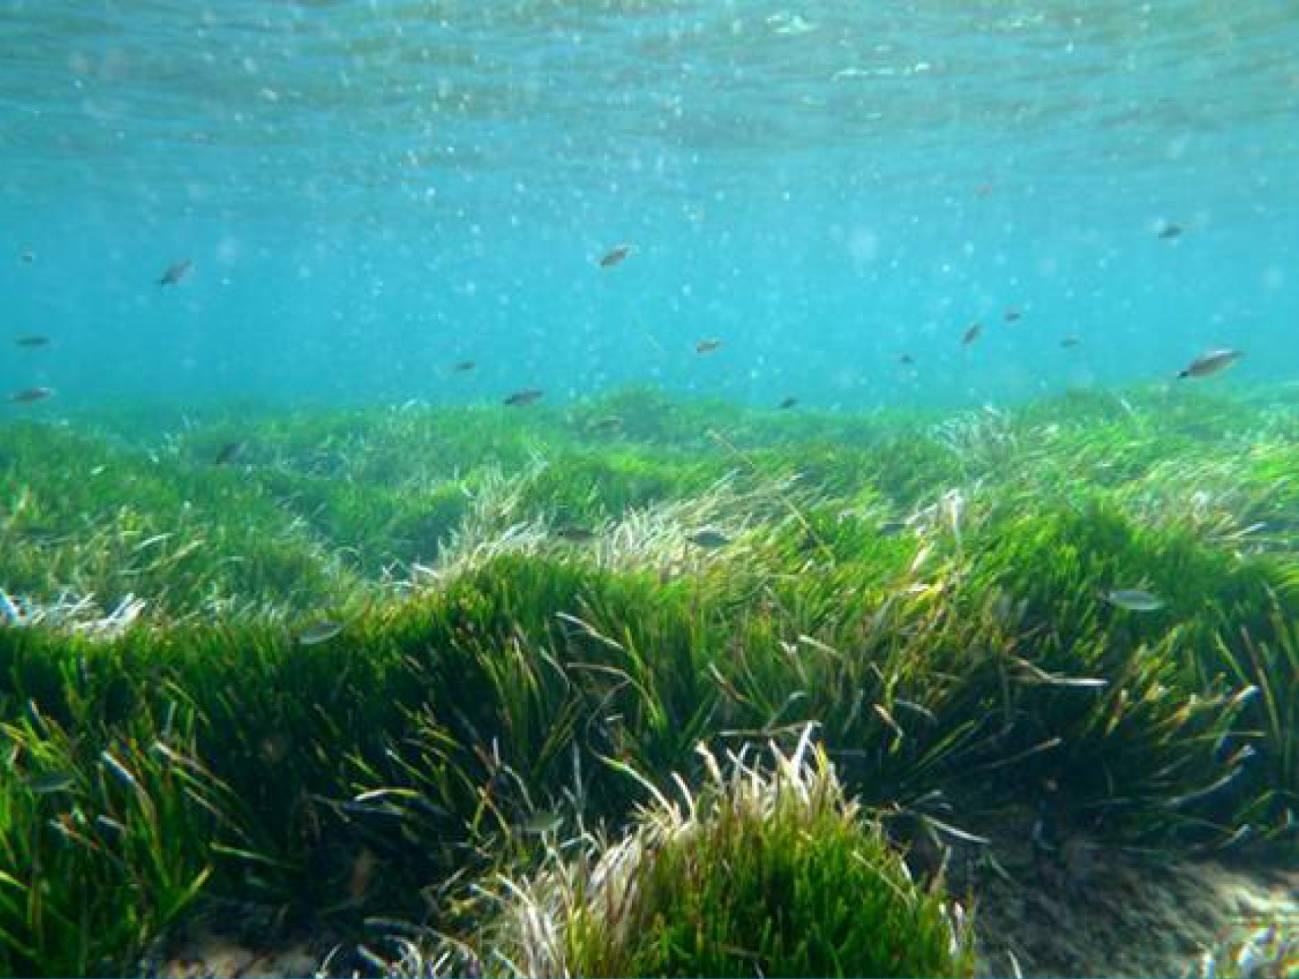 Pradera de Posidonia oceanica en Formentera (Islas Baleares). Imagen: Rachel Sussman.